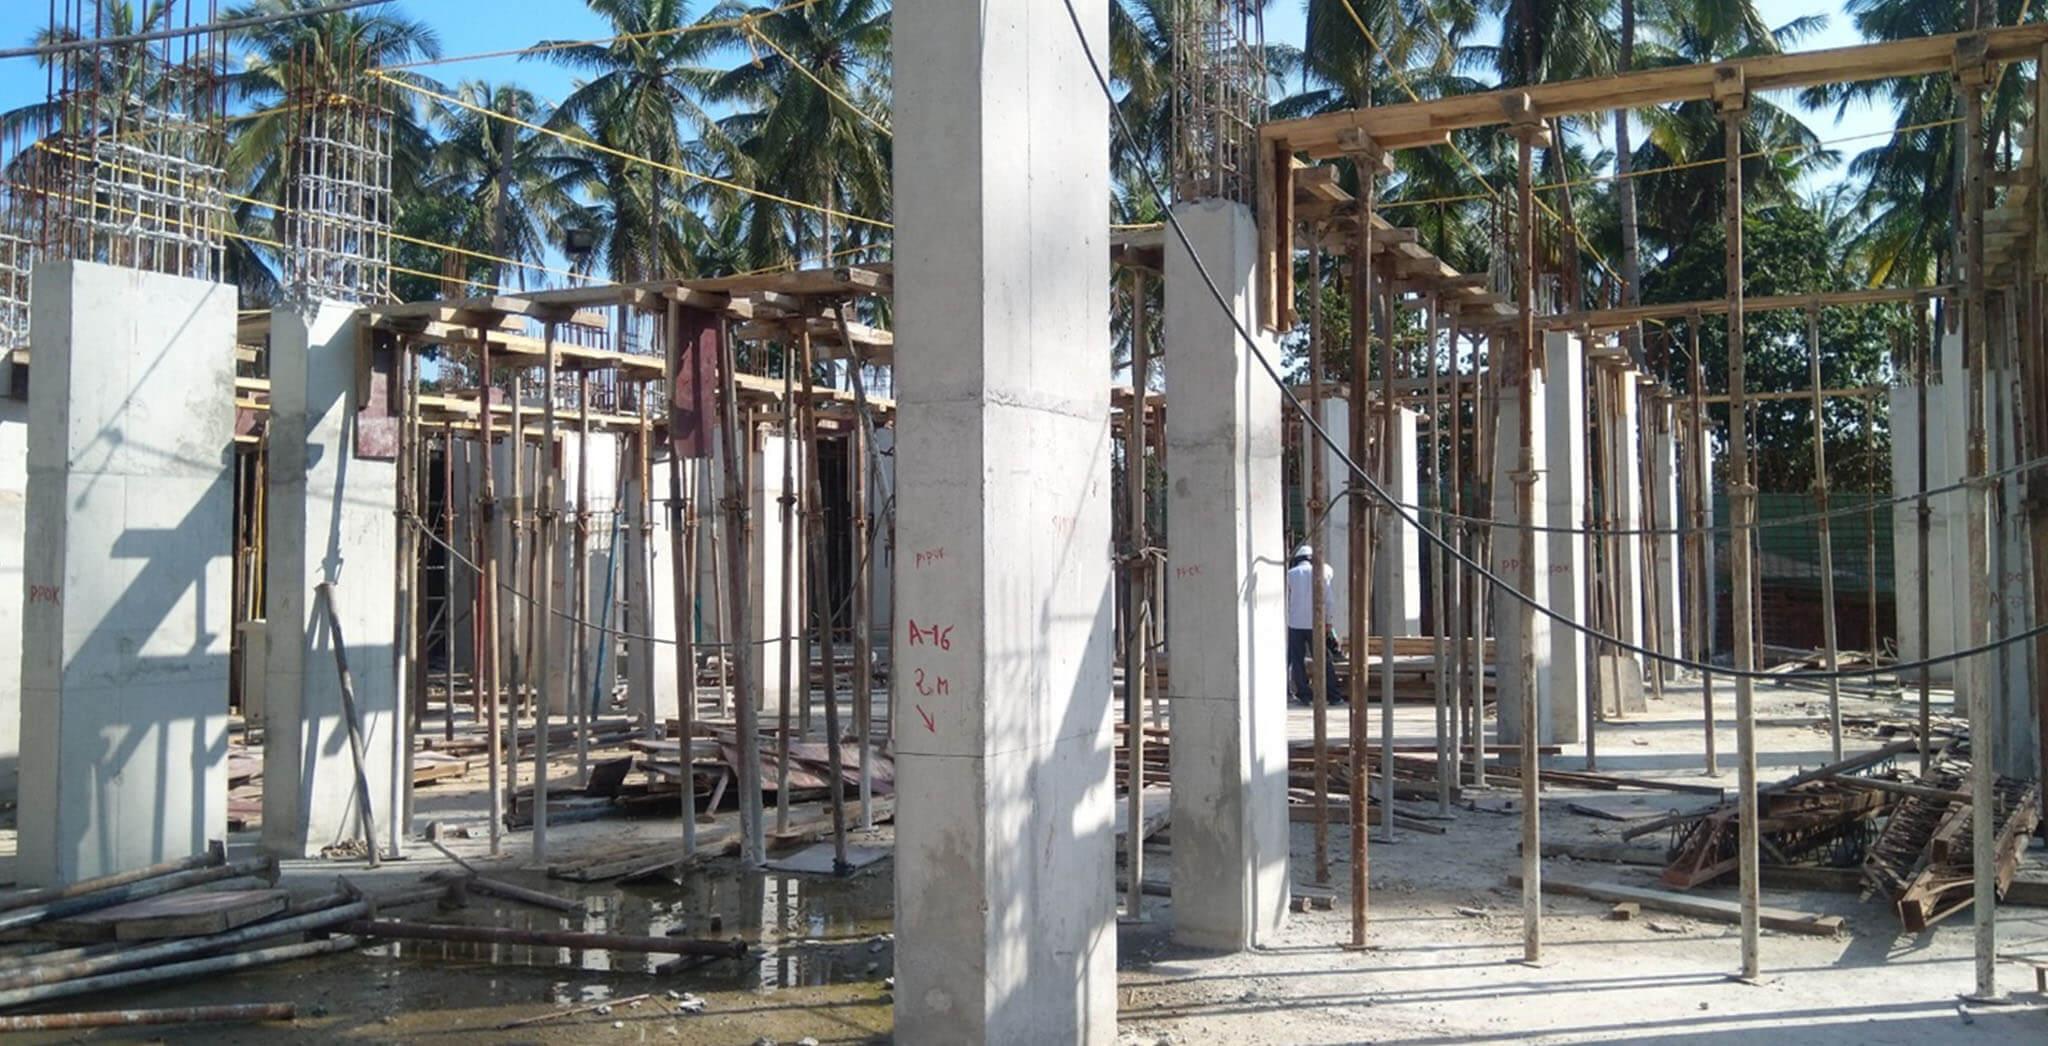 Jan 2020 - Tower-A: Wing B ground floor slab work-in-progress.